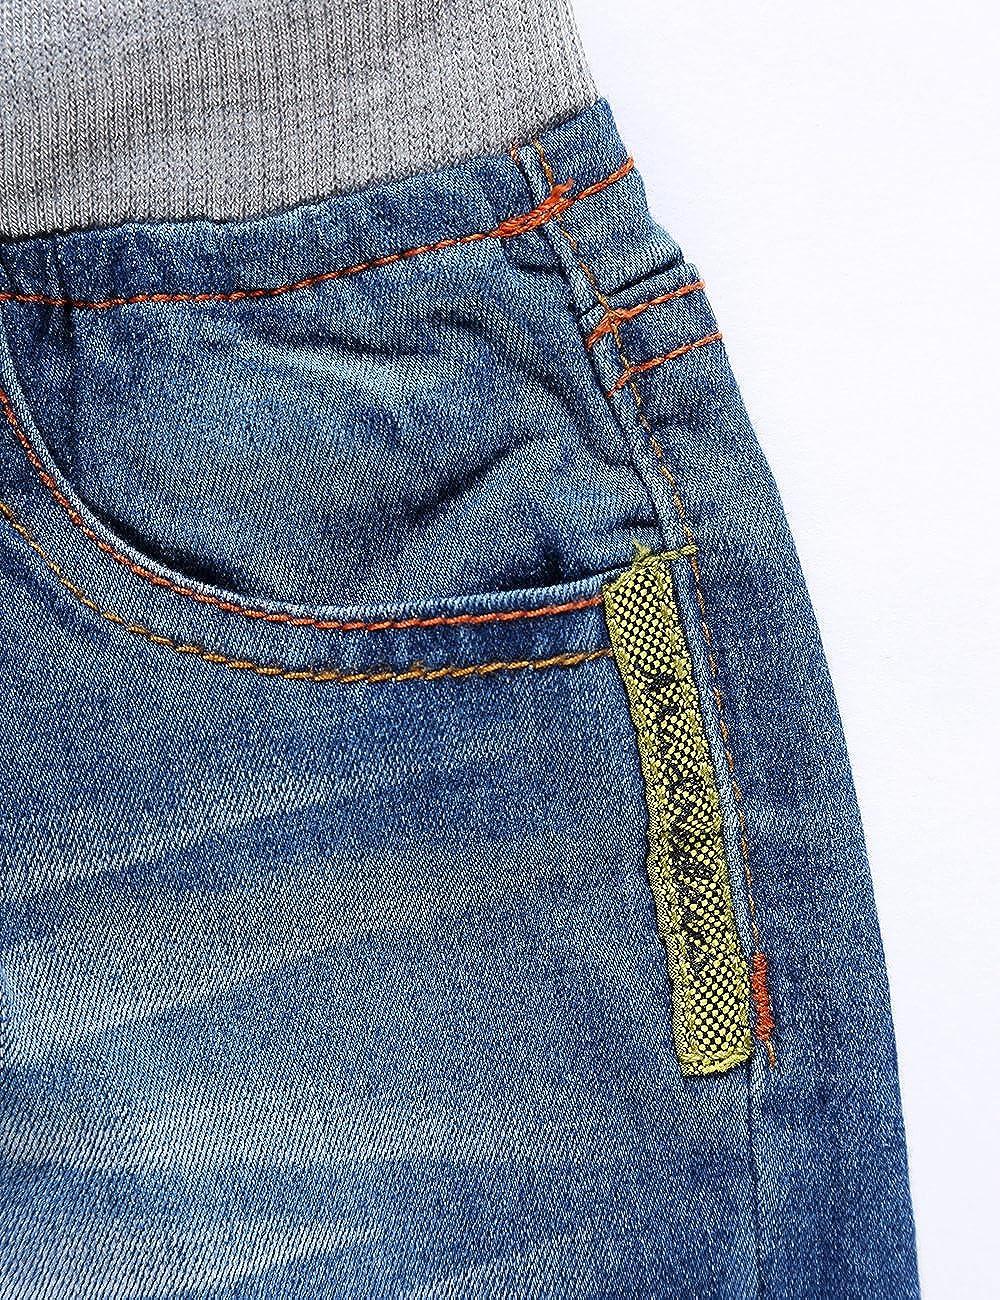 LITTLE-GUEST Little Boys Toddler Waistband Jeans Elastic Waist Straight Fit Drawstring Denim Pants B103